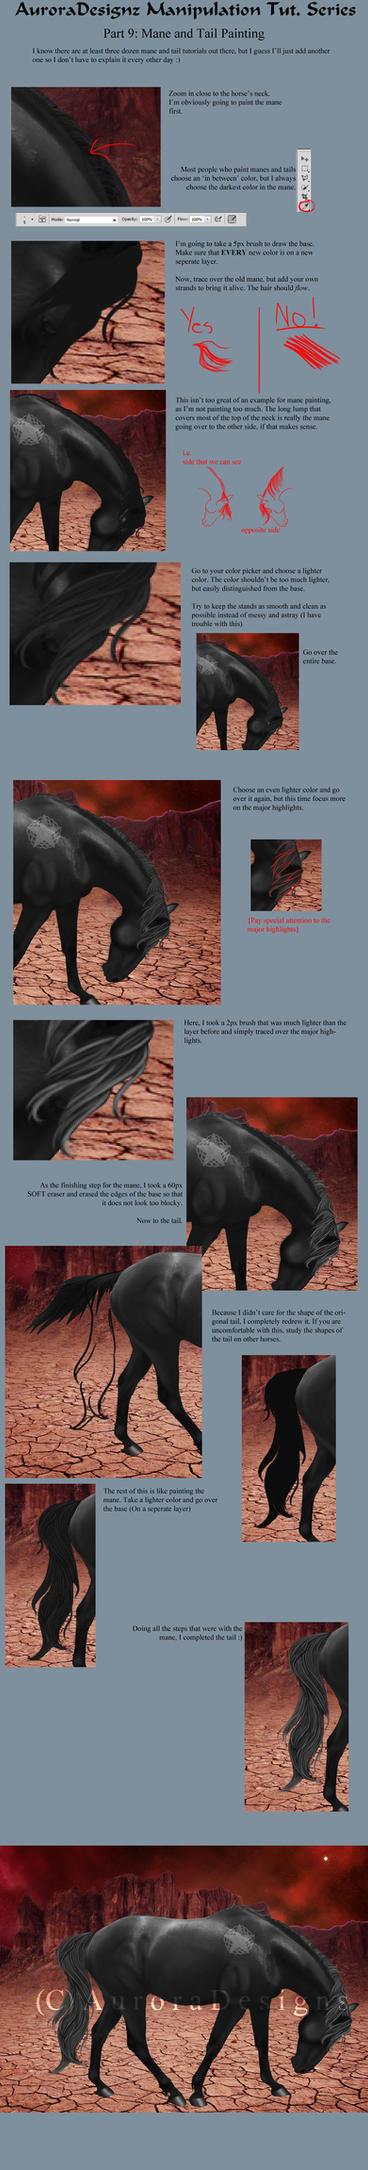 AuroraTutSeries Part 9: Mane and Tail Painting by xxAuroraStudios